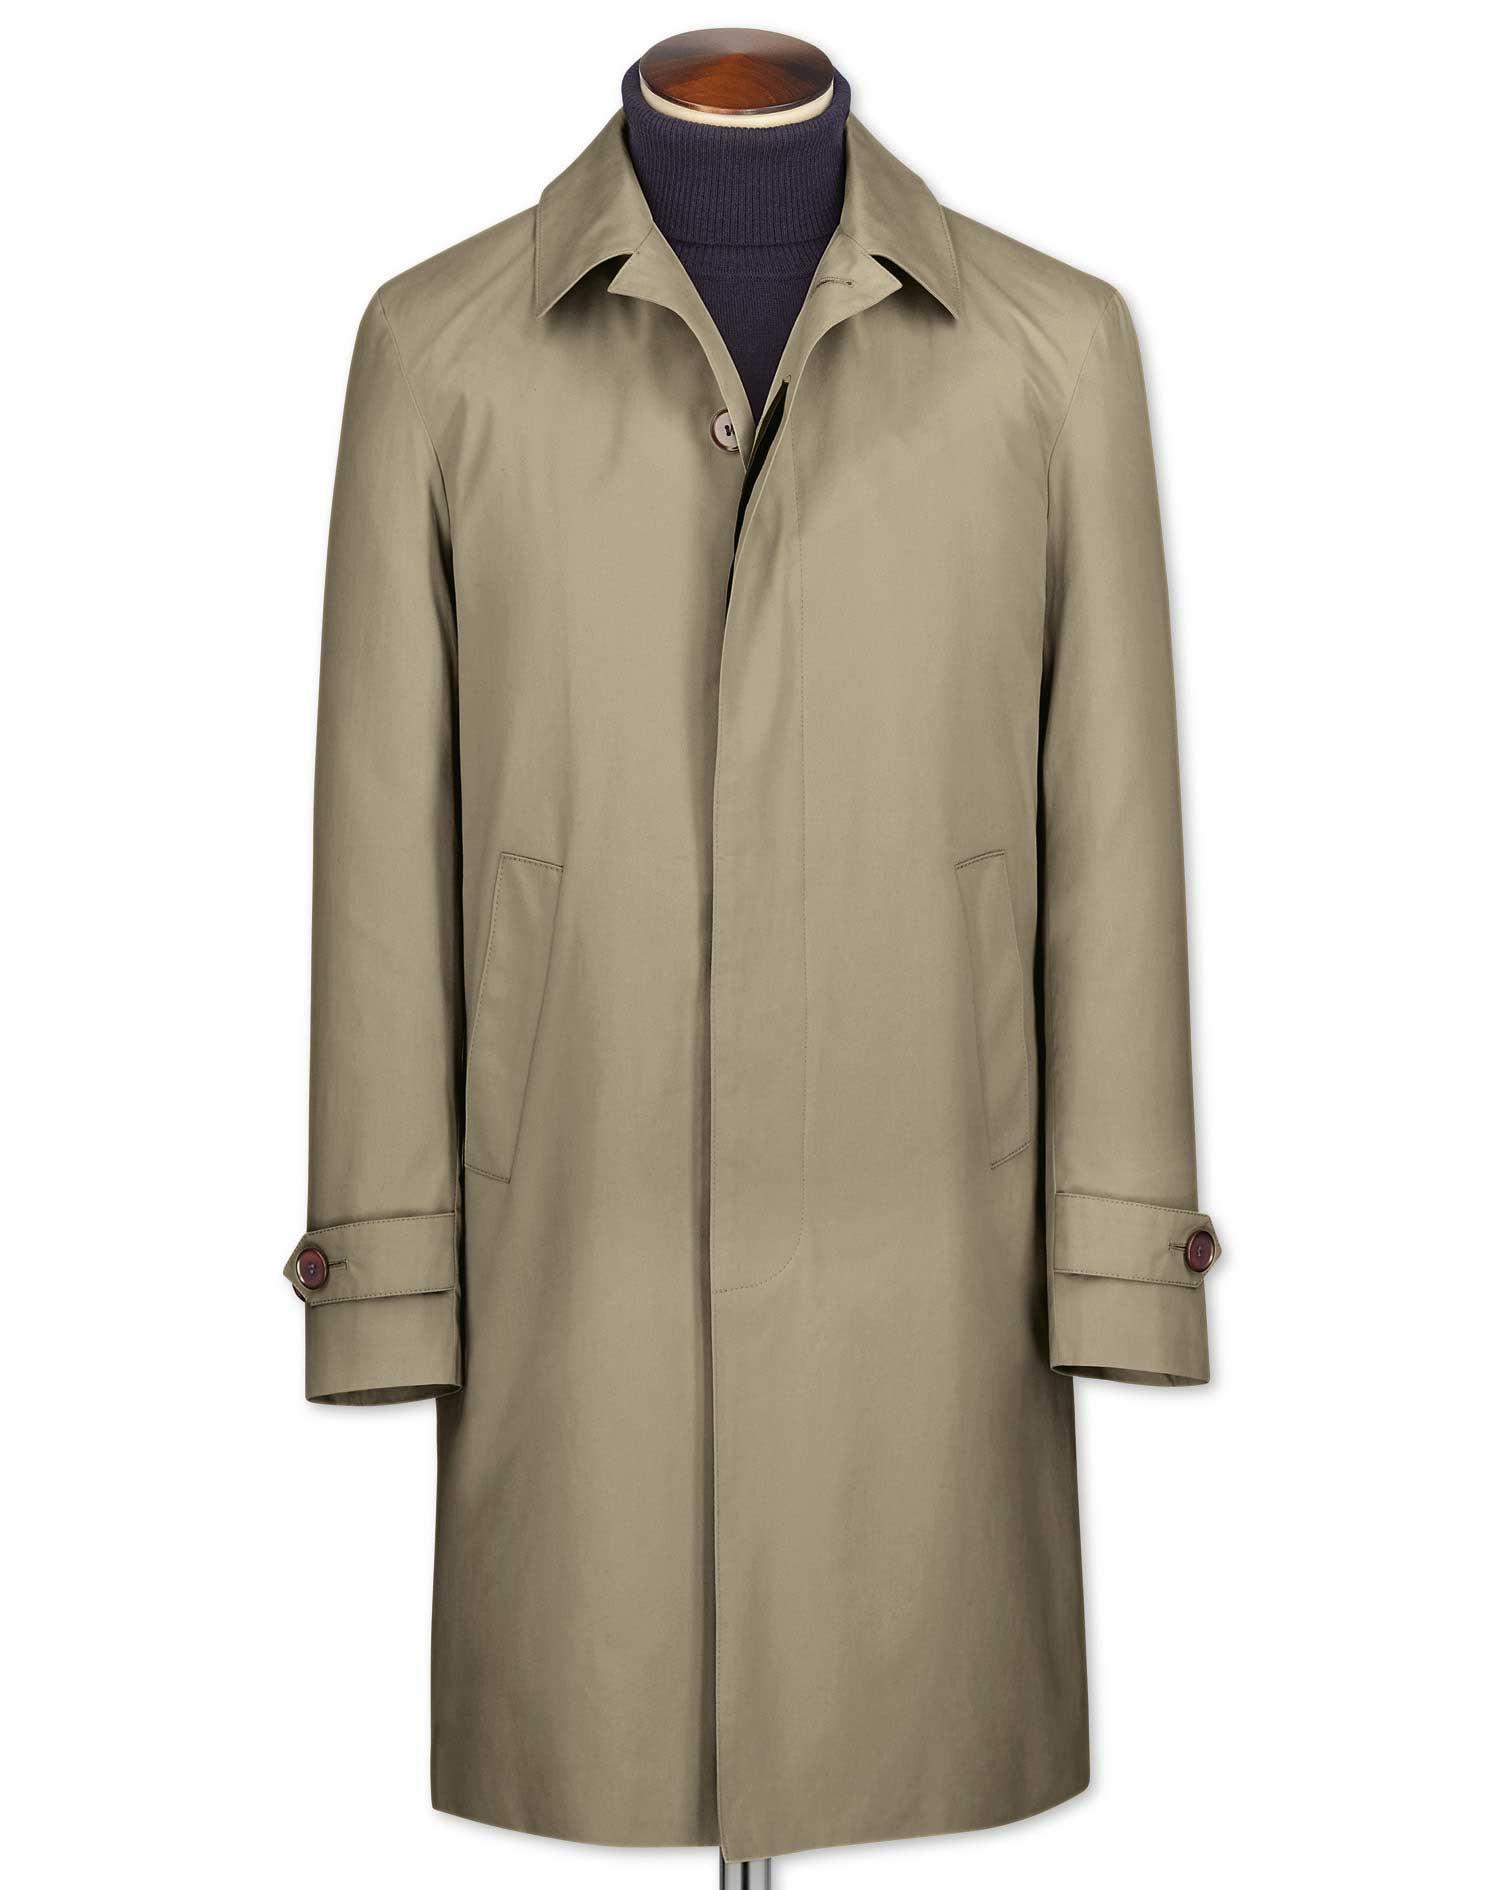 Classic Fit Stone RainCotton coat Size 46 Regular by Charles Tyrwhitt